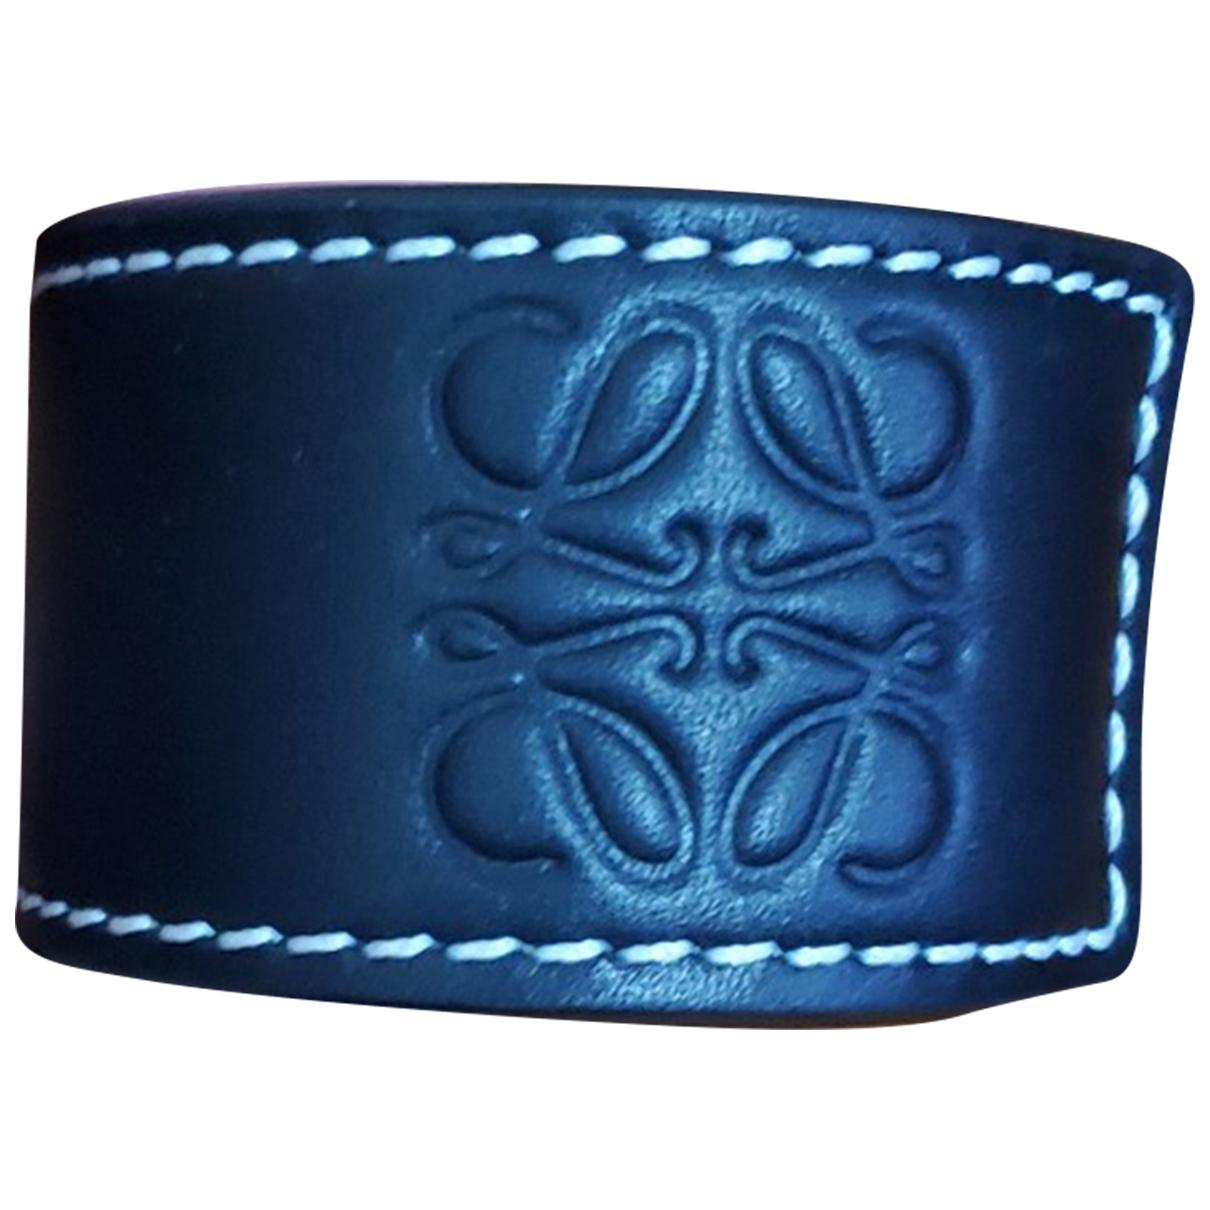 Loewe - Bijoux   pour homme en cuir - noir